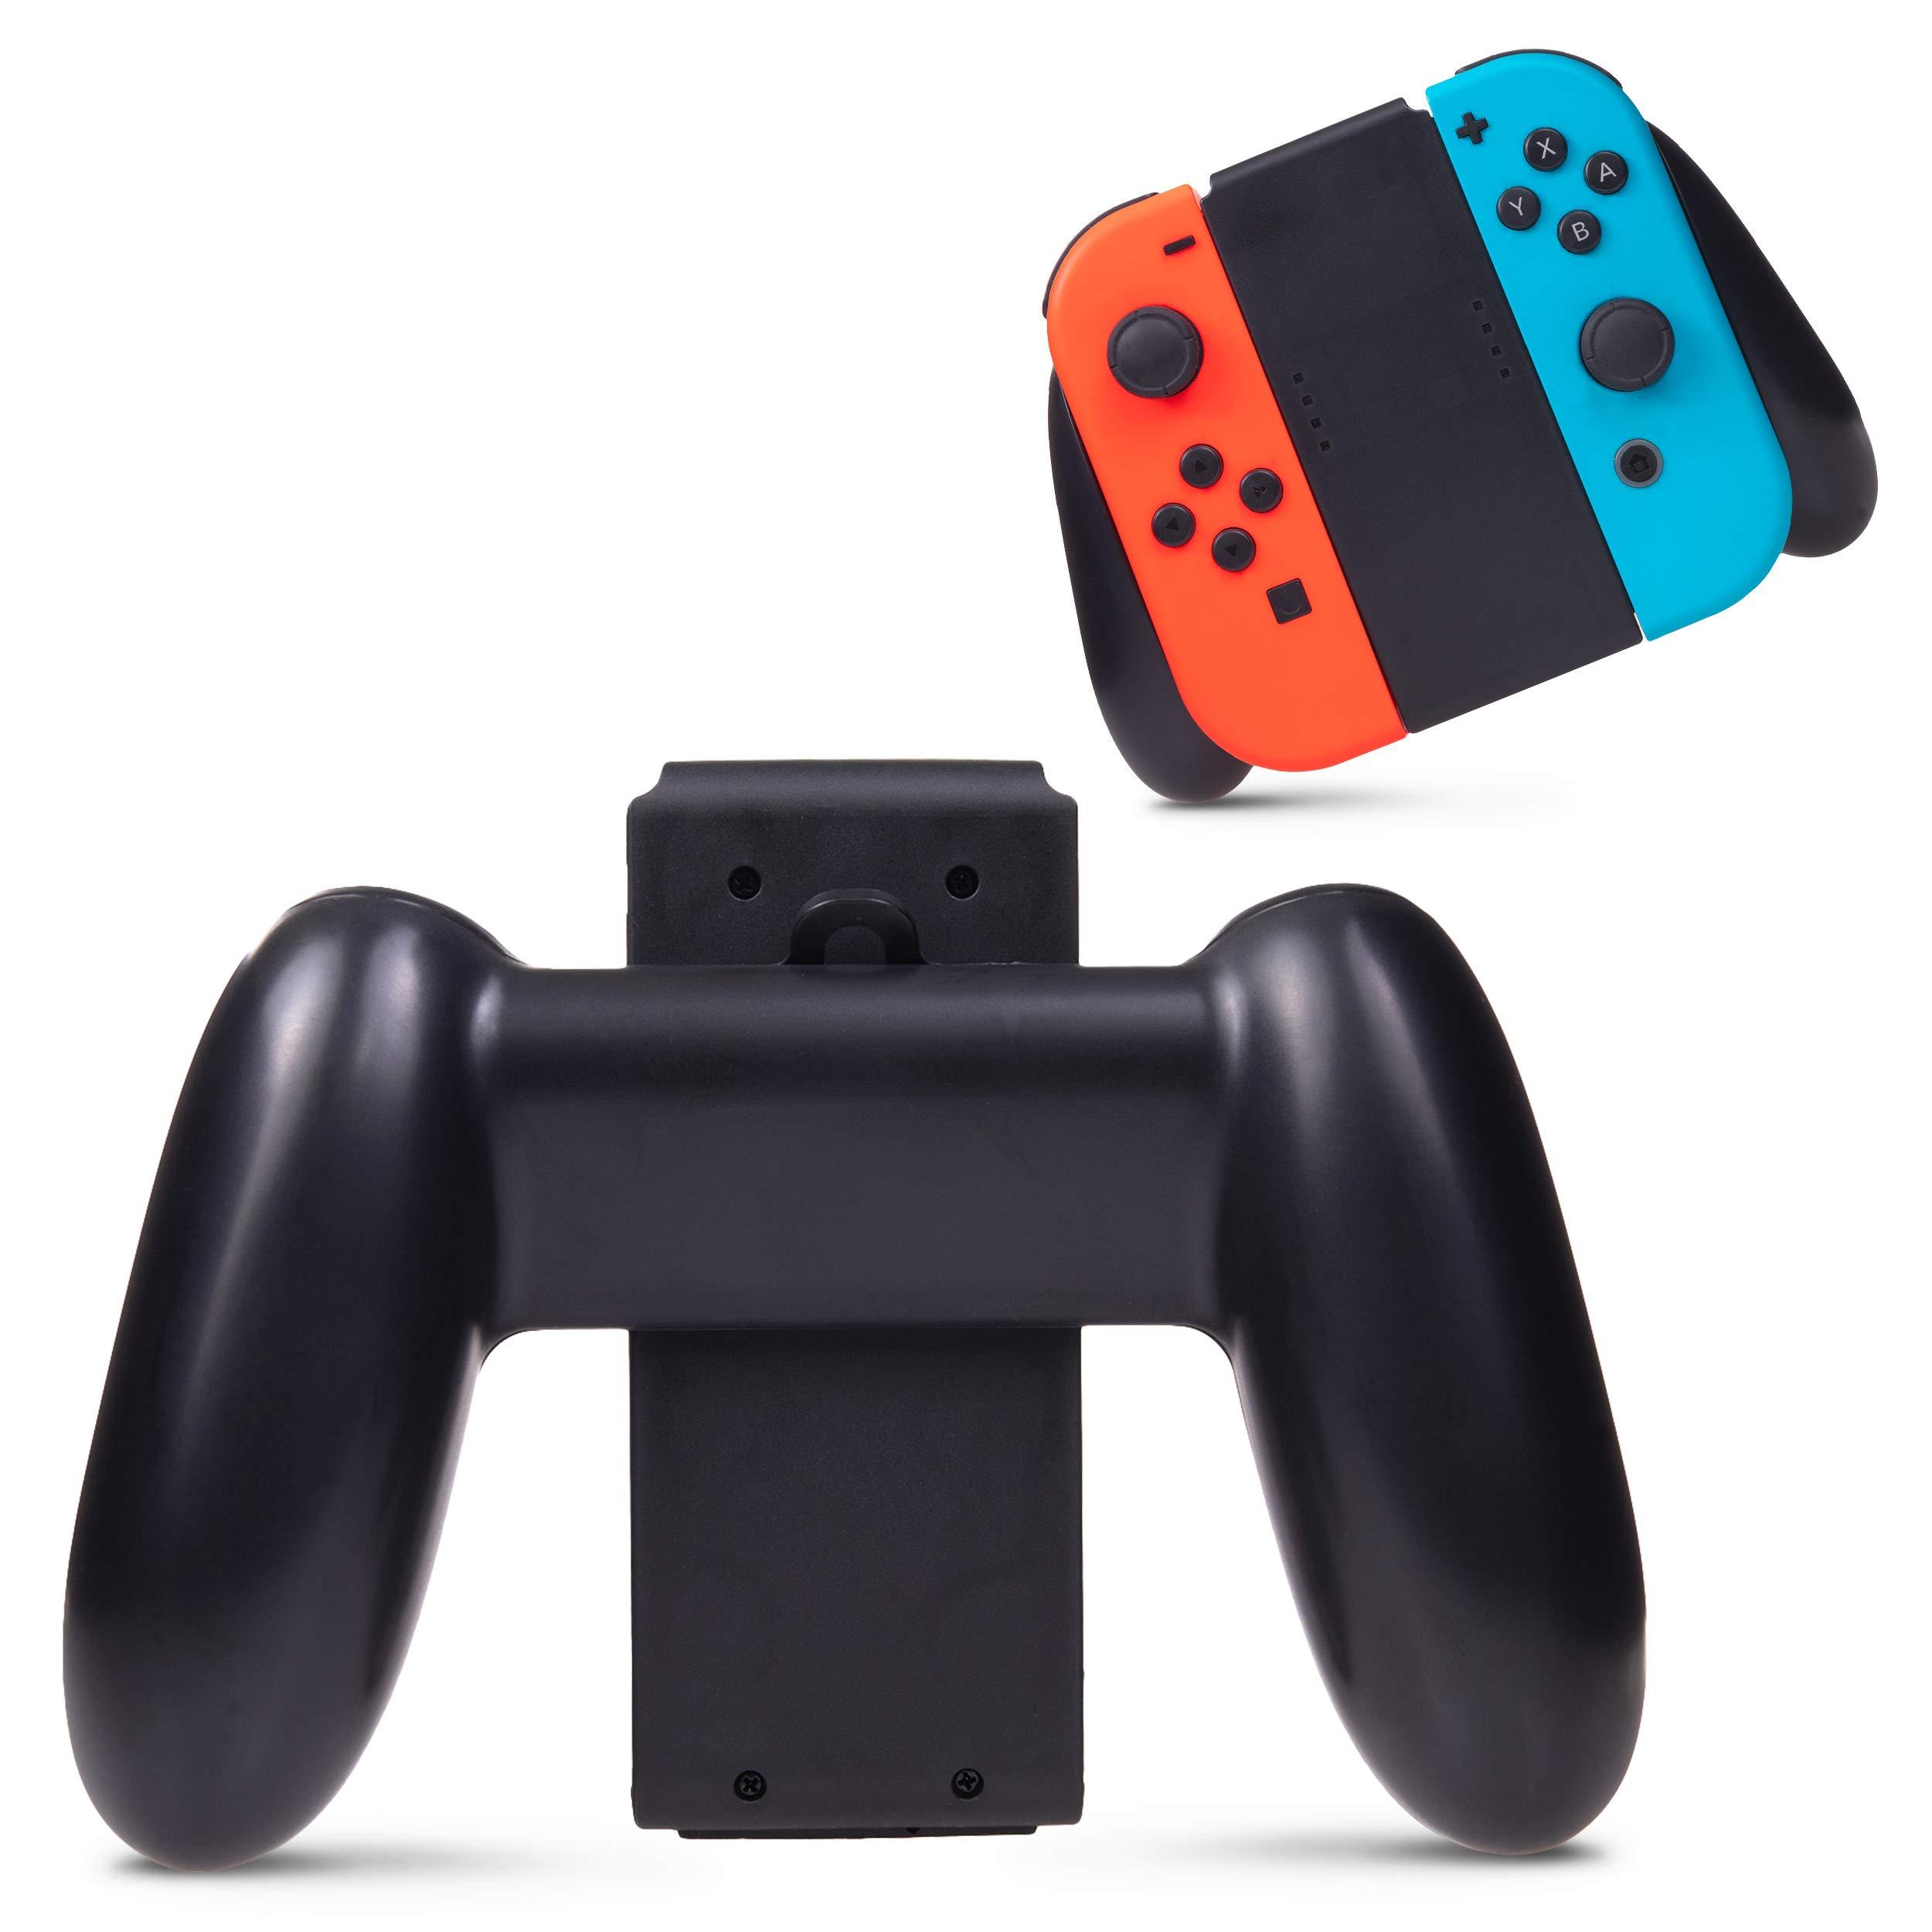 Advanctech Hand Grip for Nintendo Switch Joy-Con Controllers, Ergonomic Handheld Gaming Handles by Advanctech